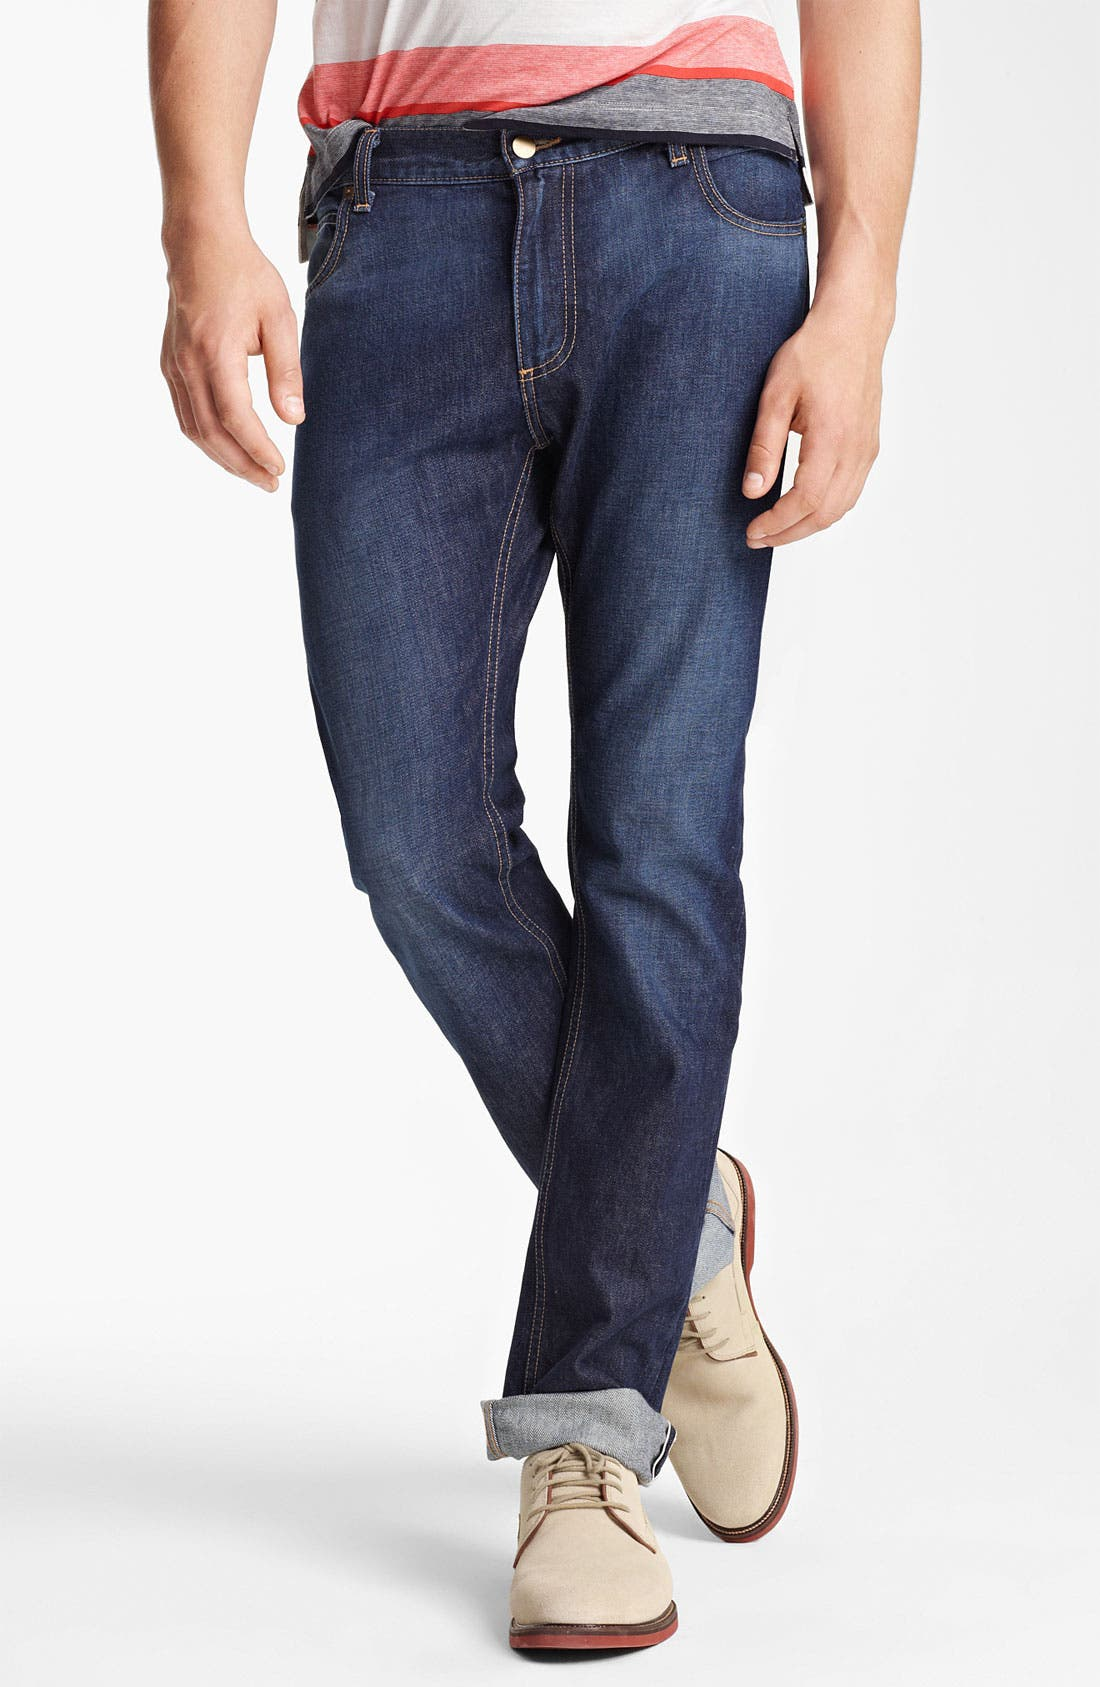 Alternate Image 1 Selected - Billy Reid Slim Fit Jeans (Washed Blue)